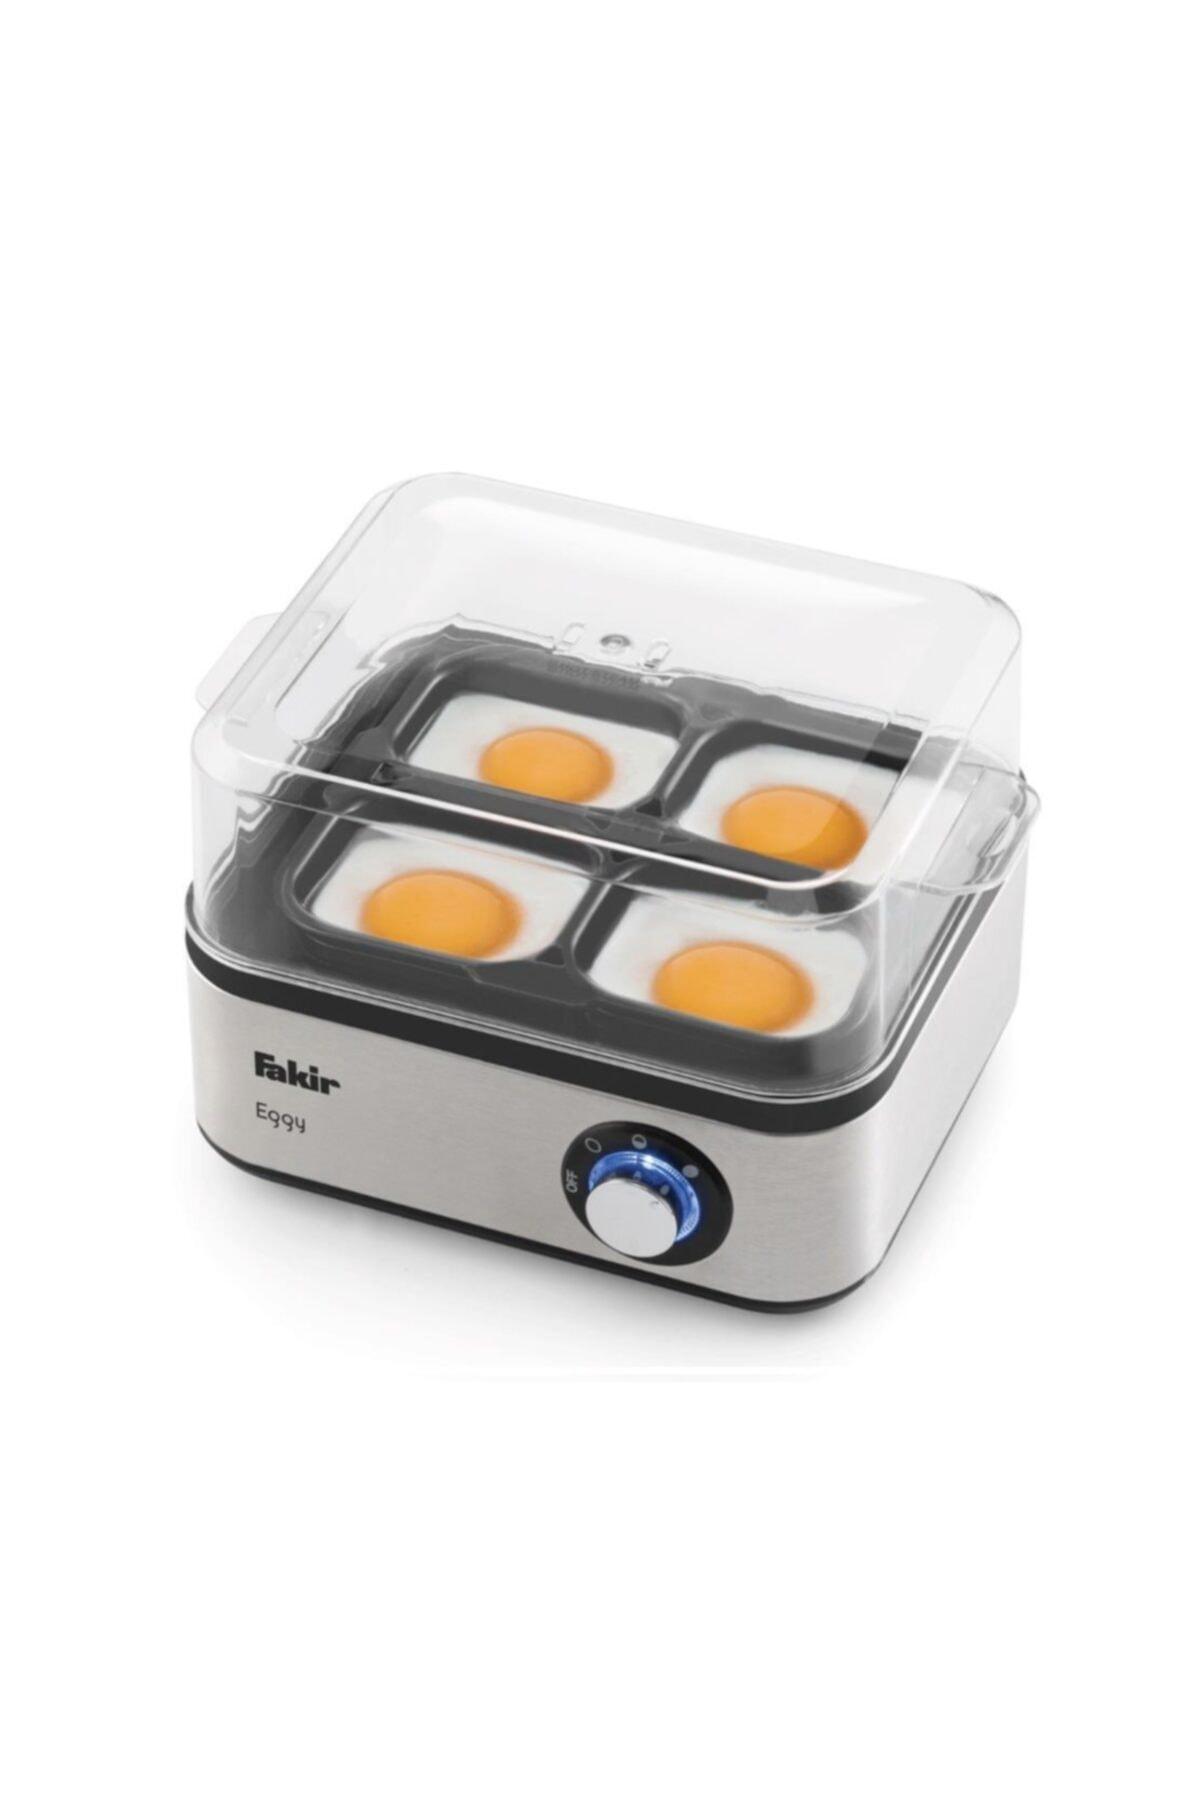 Fakir Eggy Yumurta Pişirme Makinesi